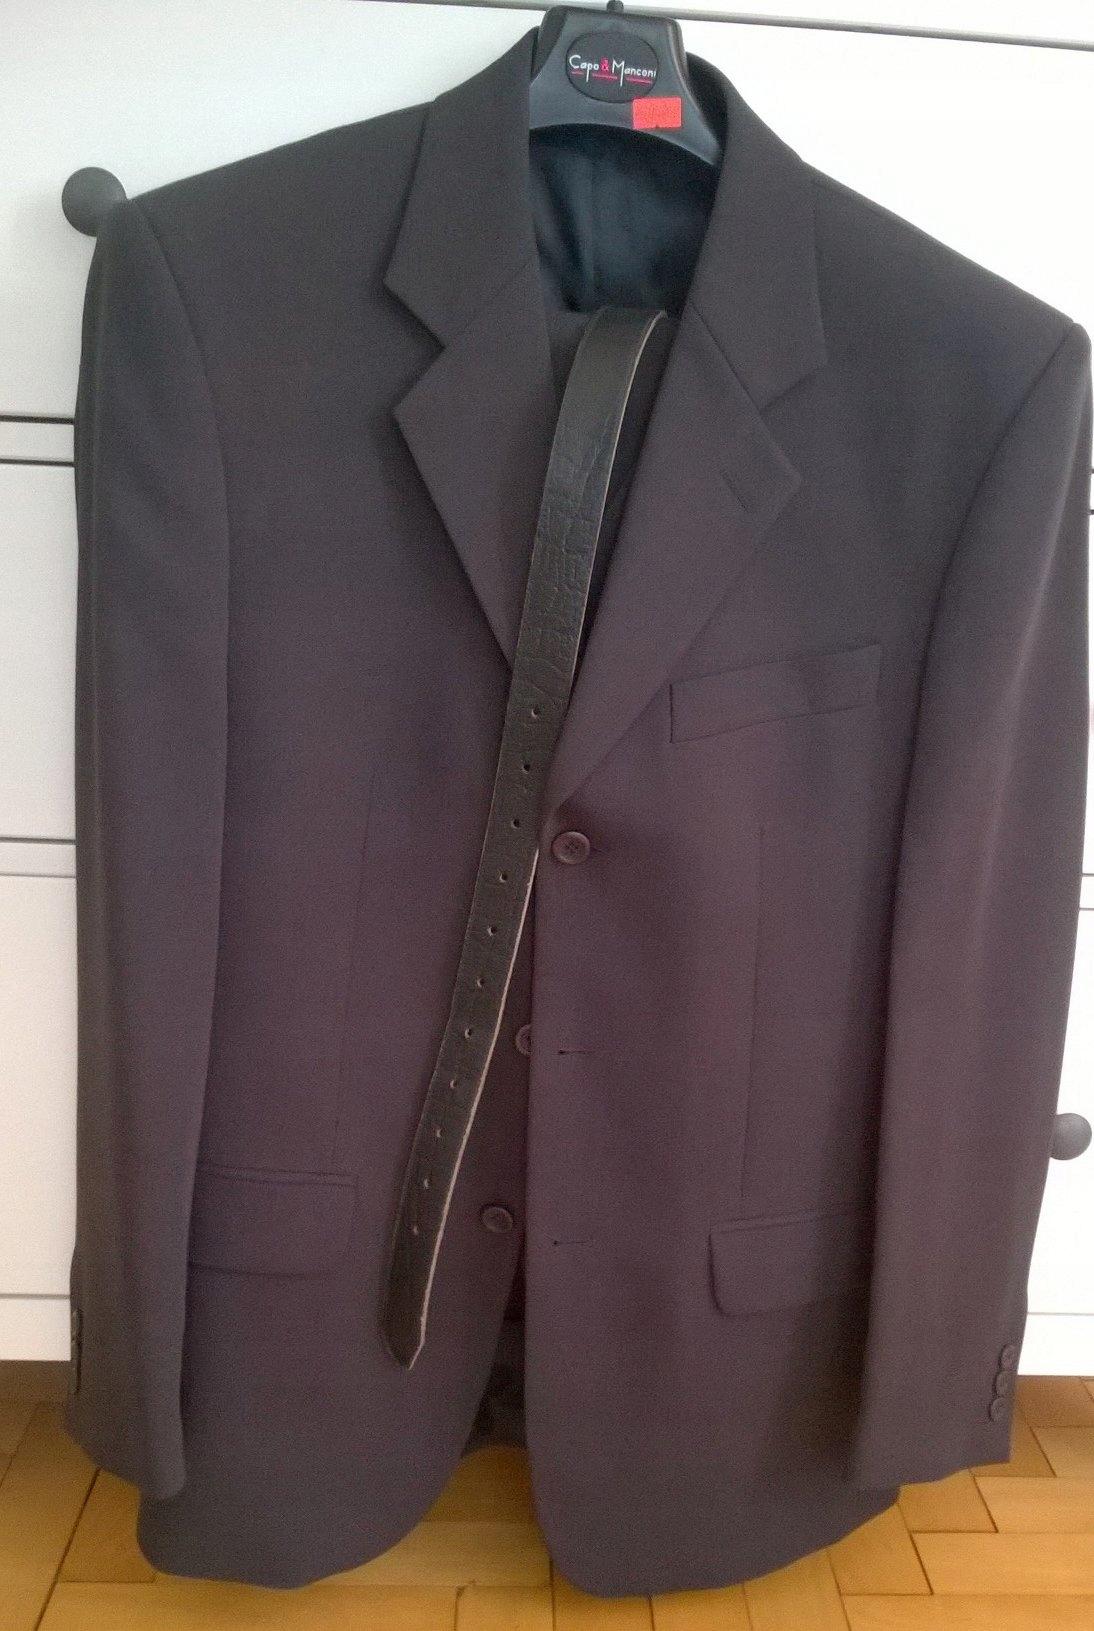 e16407898b35c GARNITUR MĘSKI rozm L + GRATIS krawat/koszula - 7373546305 ...